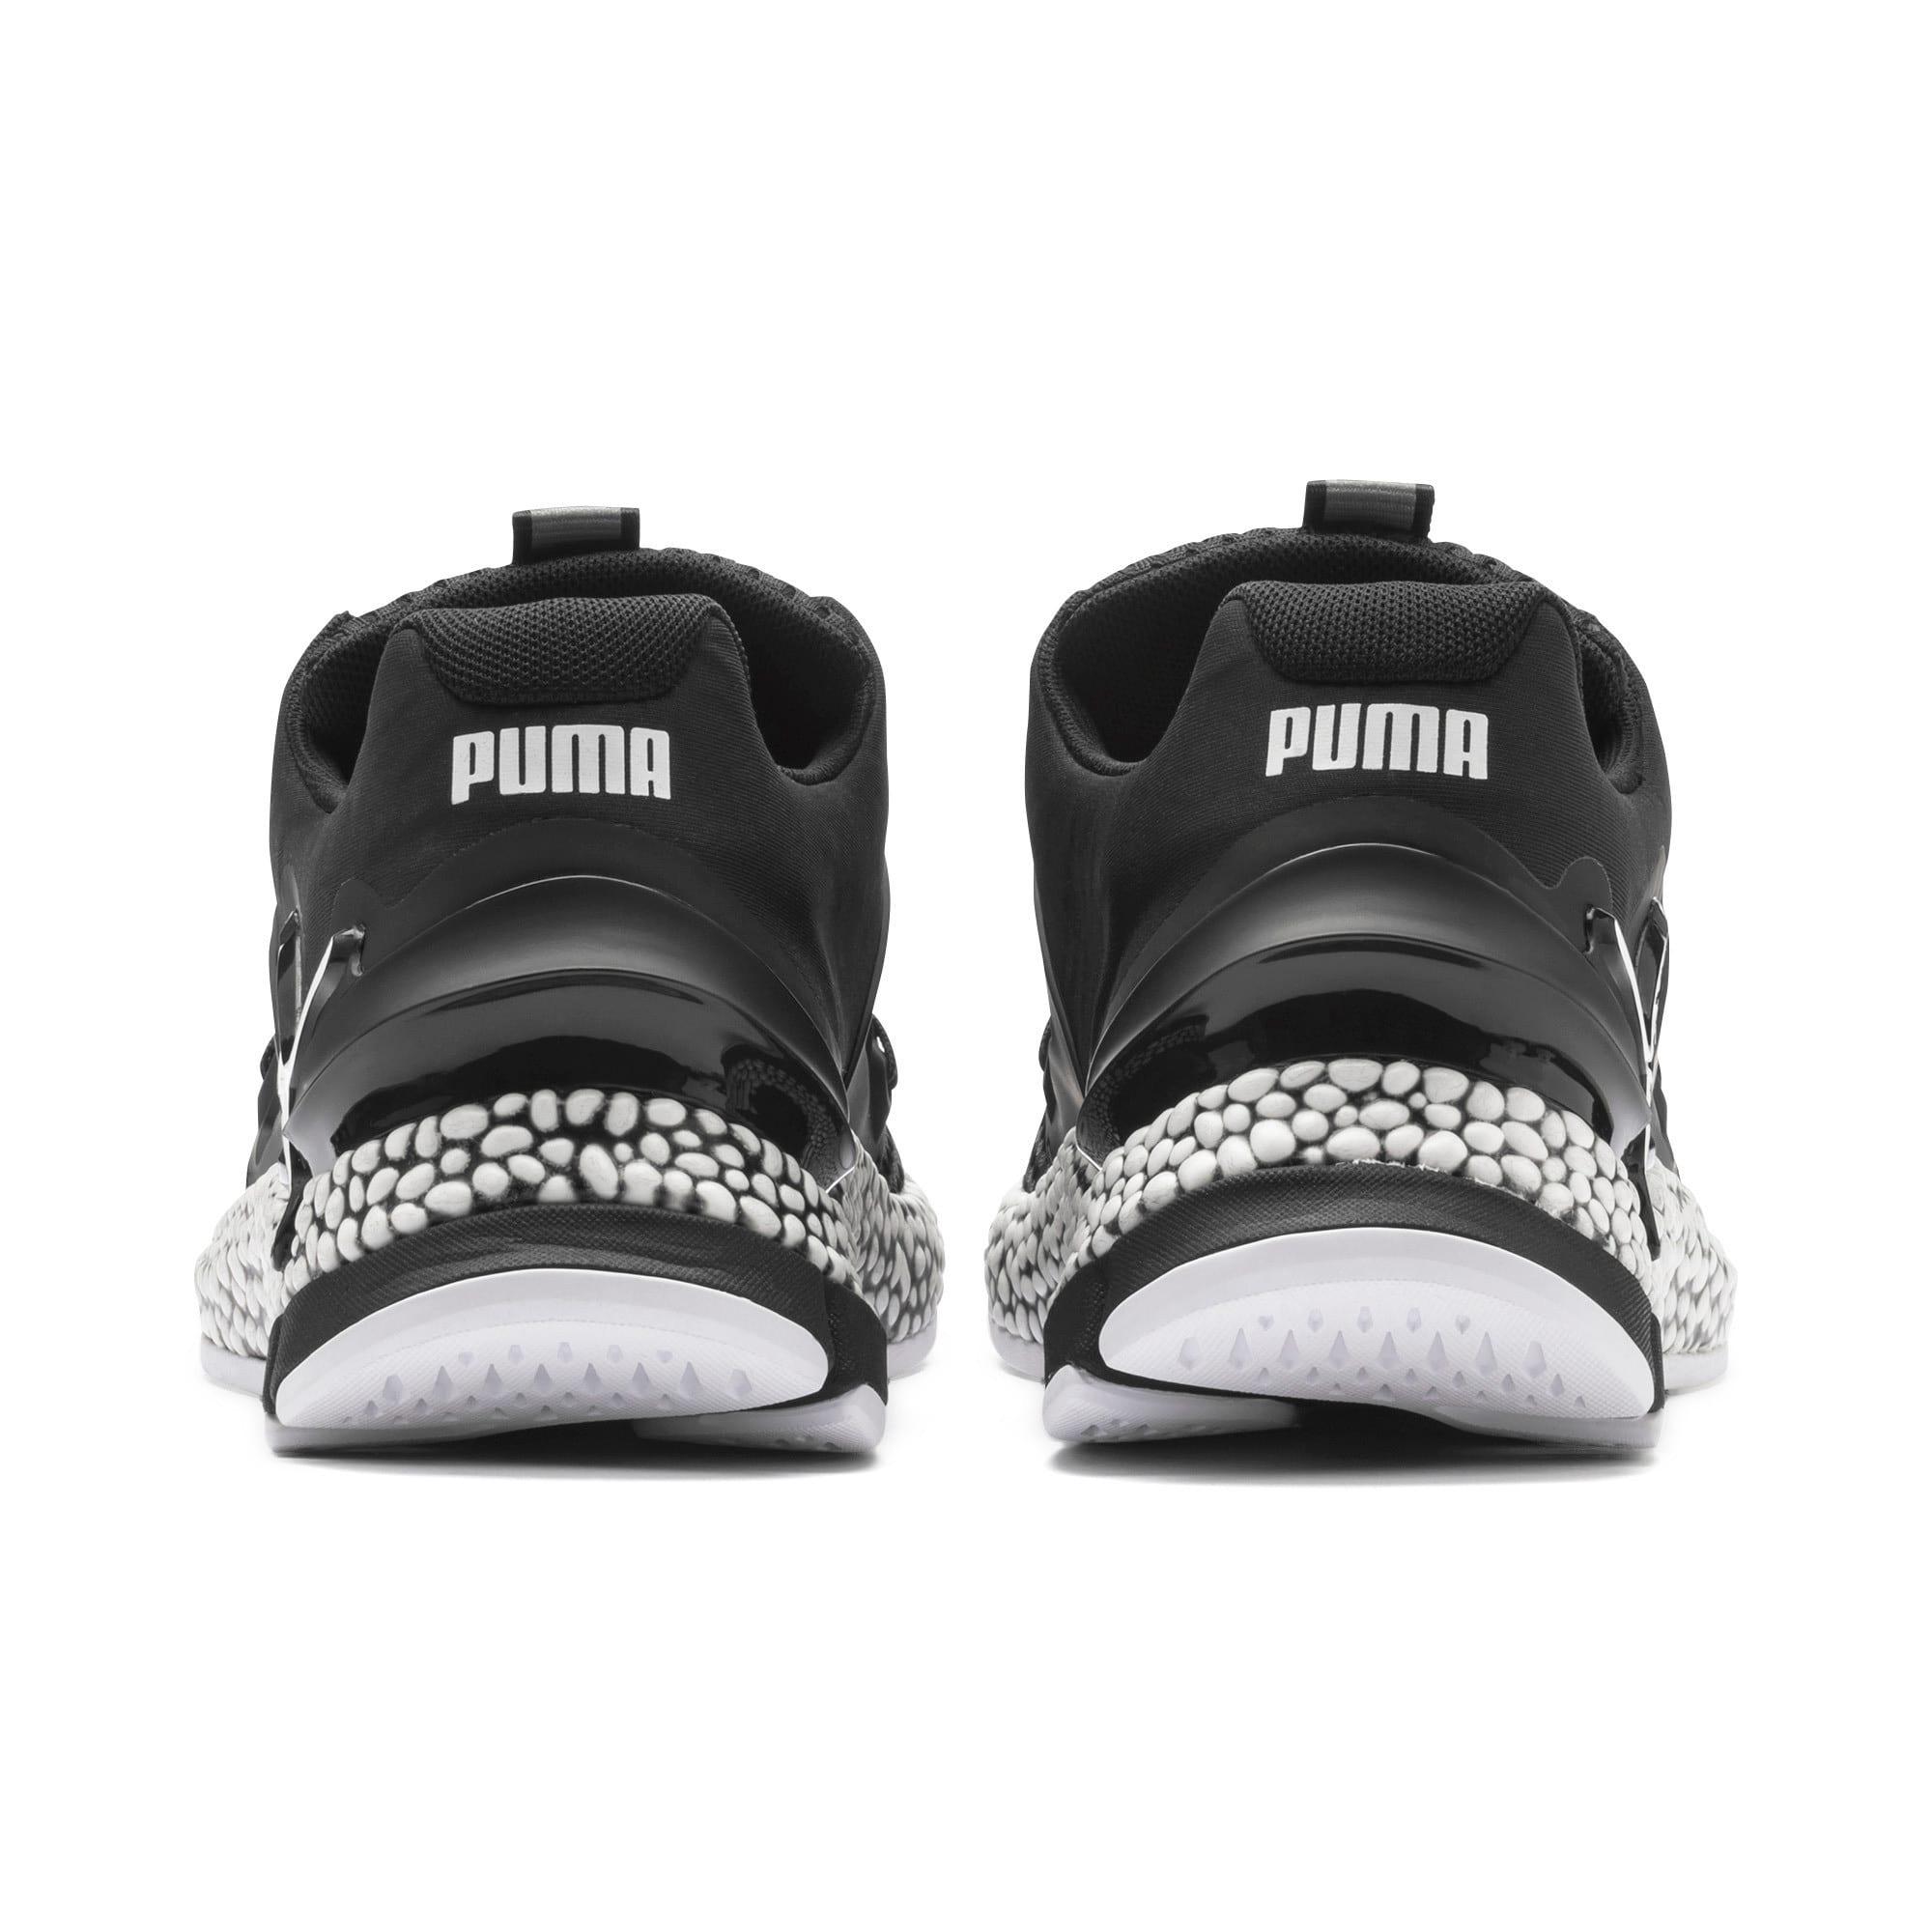 Thumbnail 4 of HYBRID Sky hardloopschoenen voor heren, Puma Black-Puma White, medium